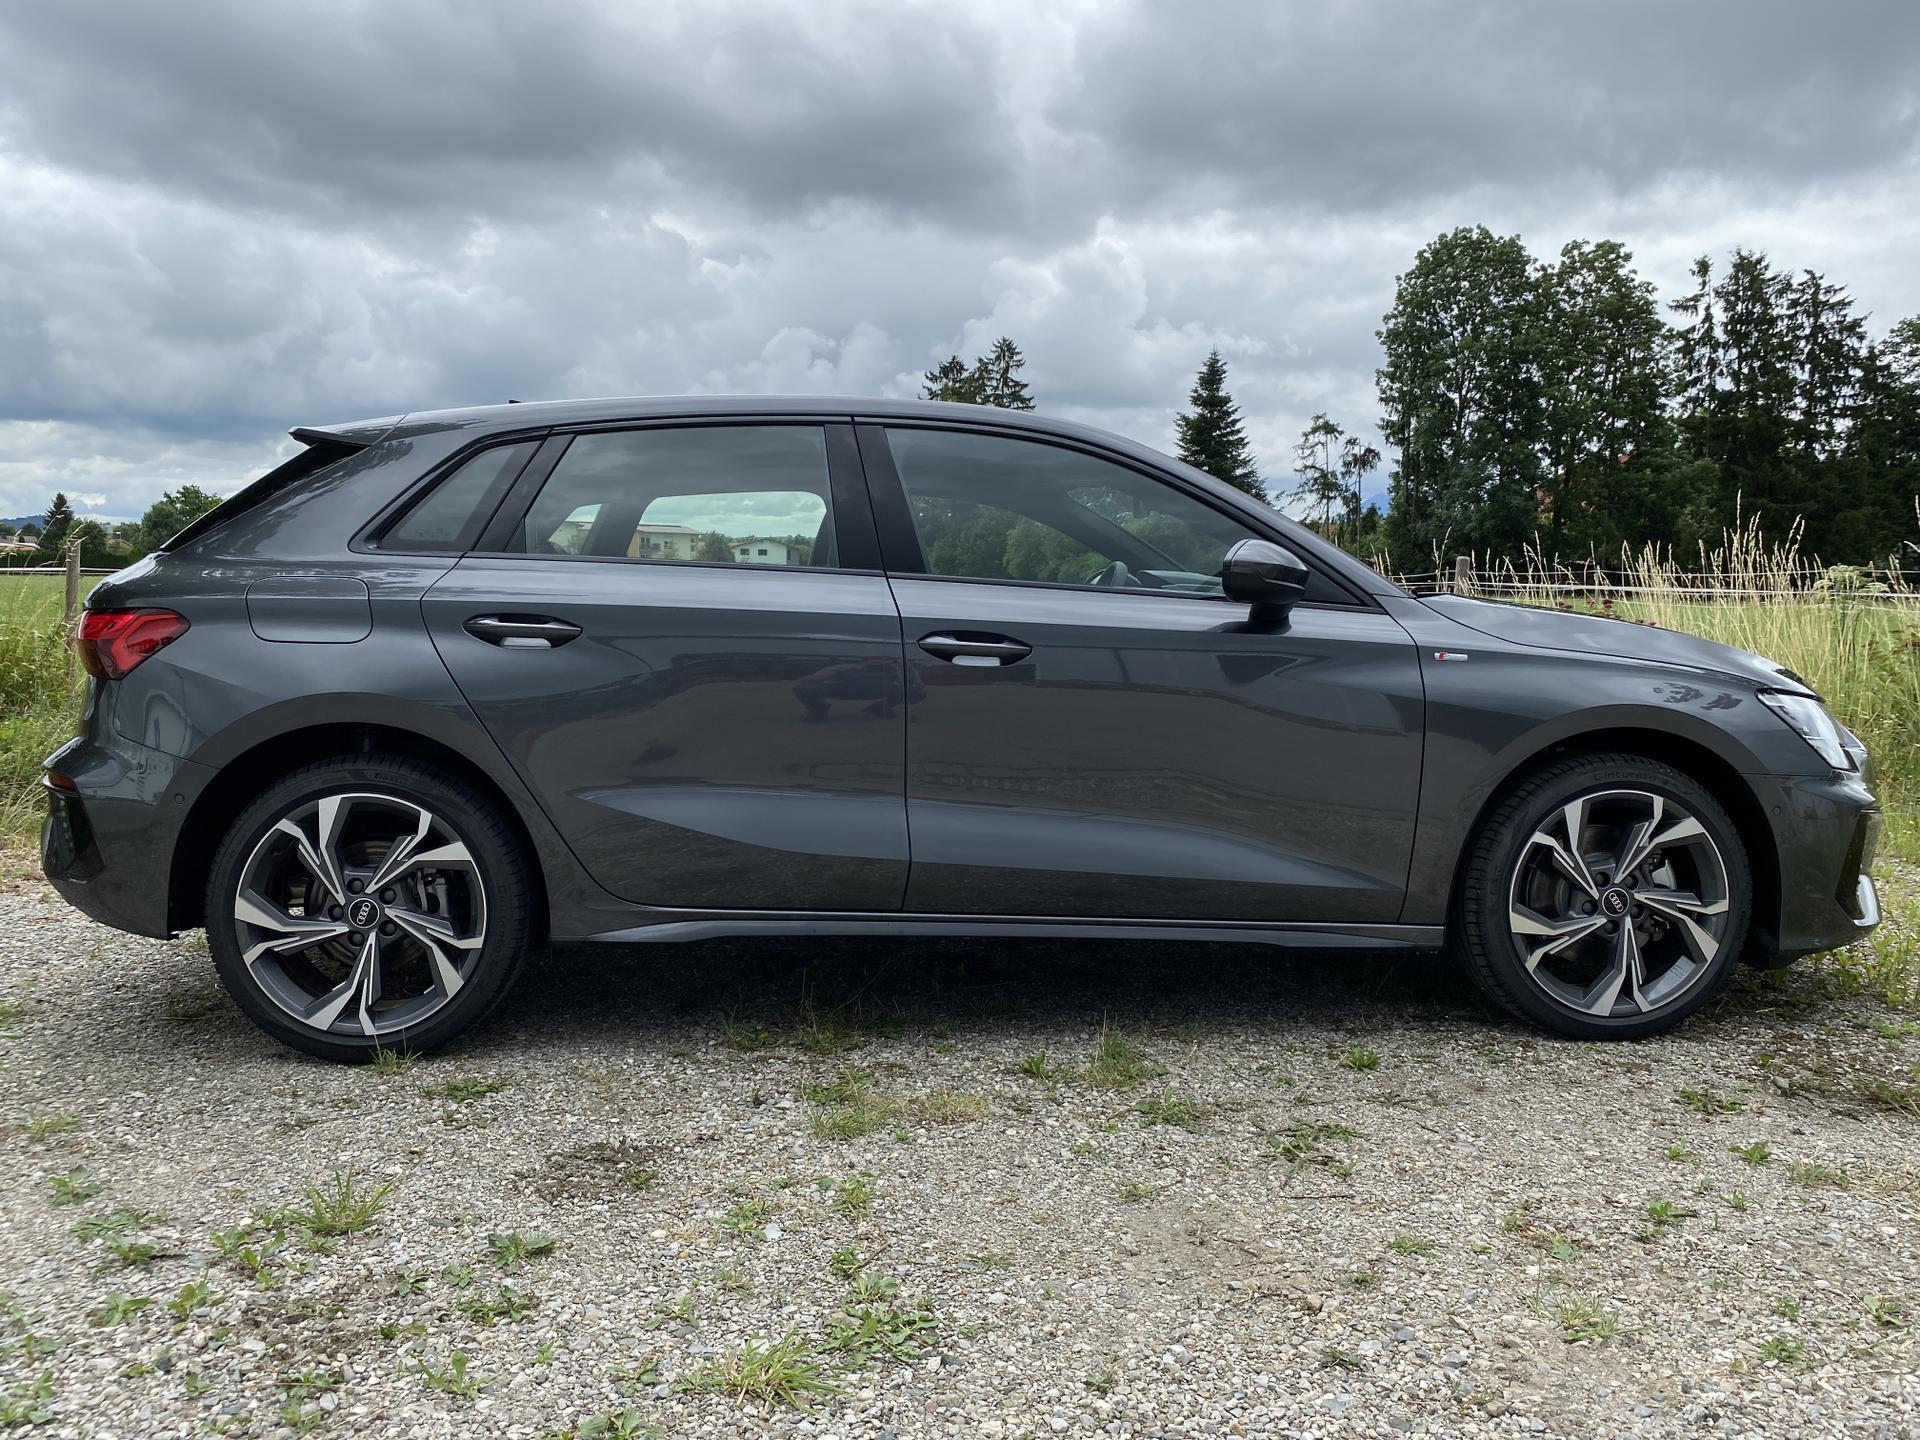 Audi A3 Beifahrerseite